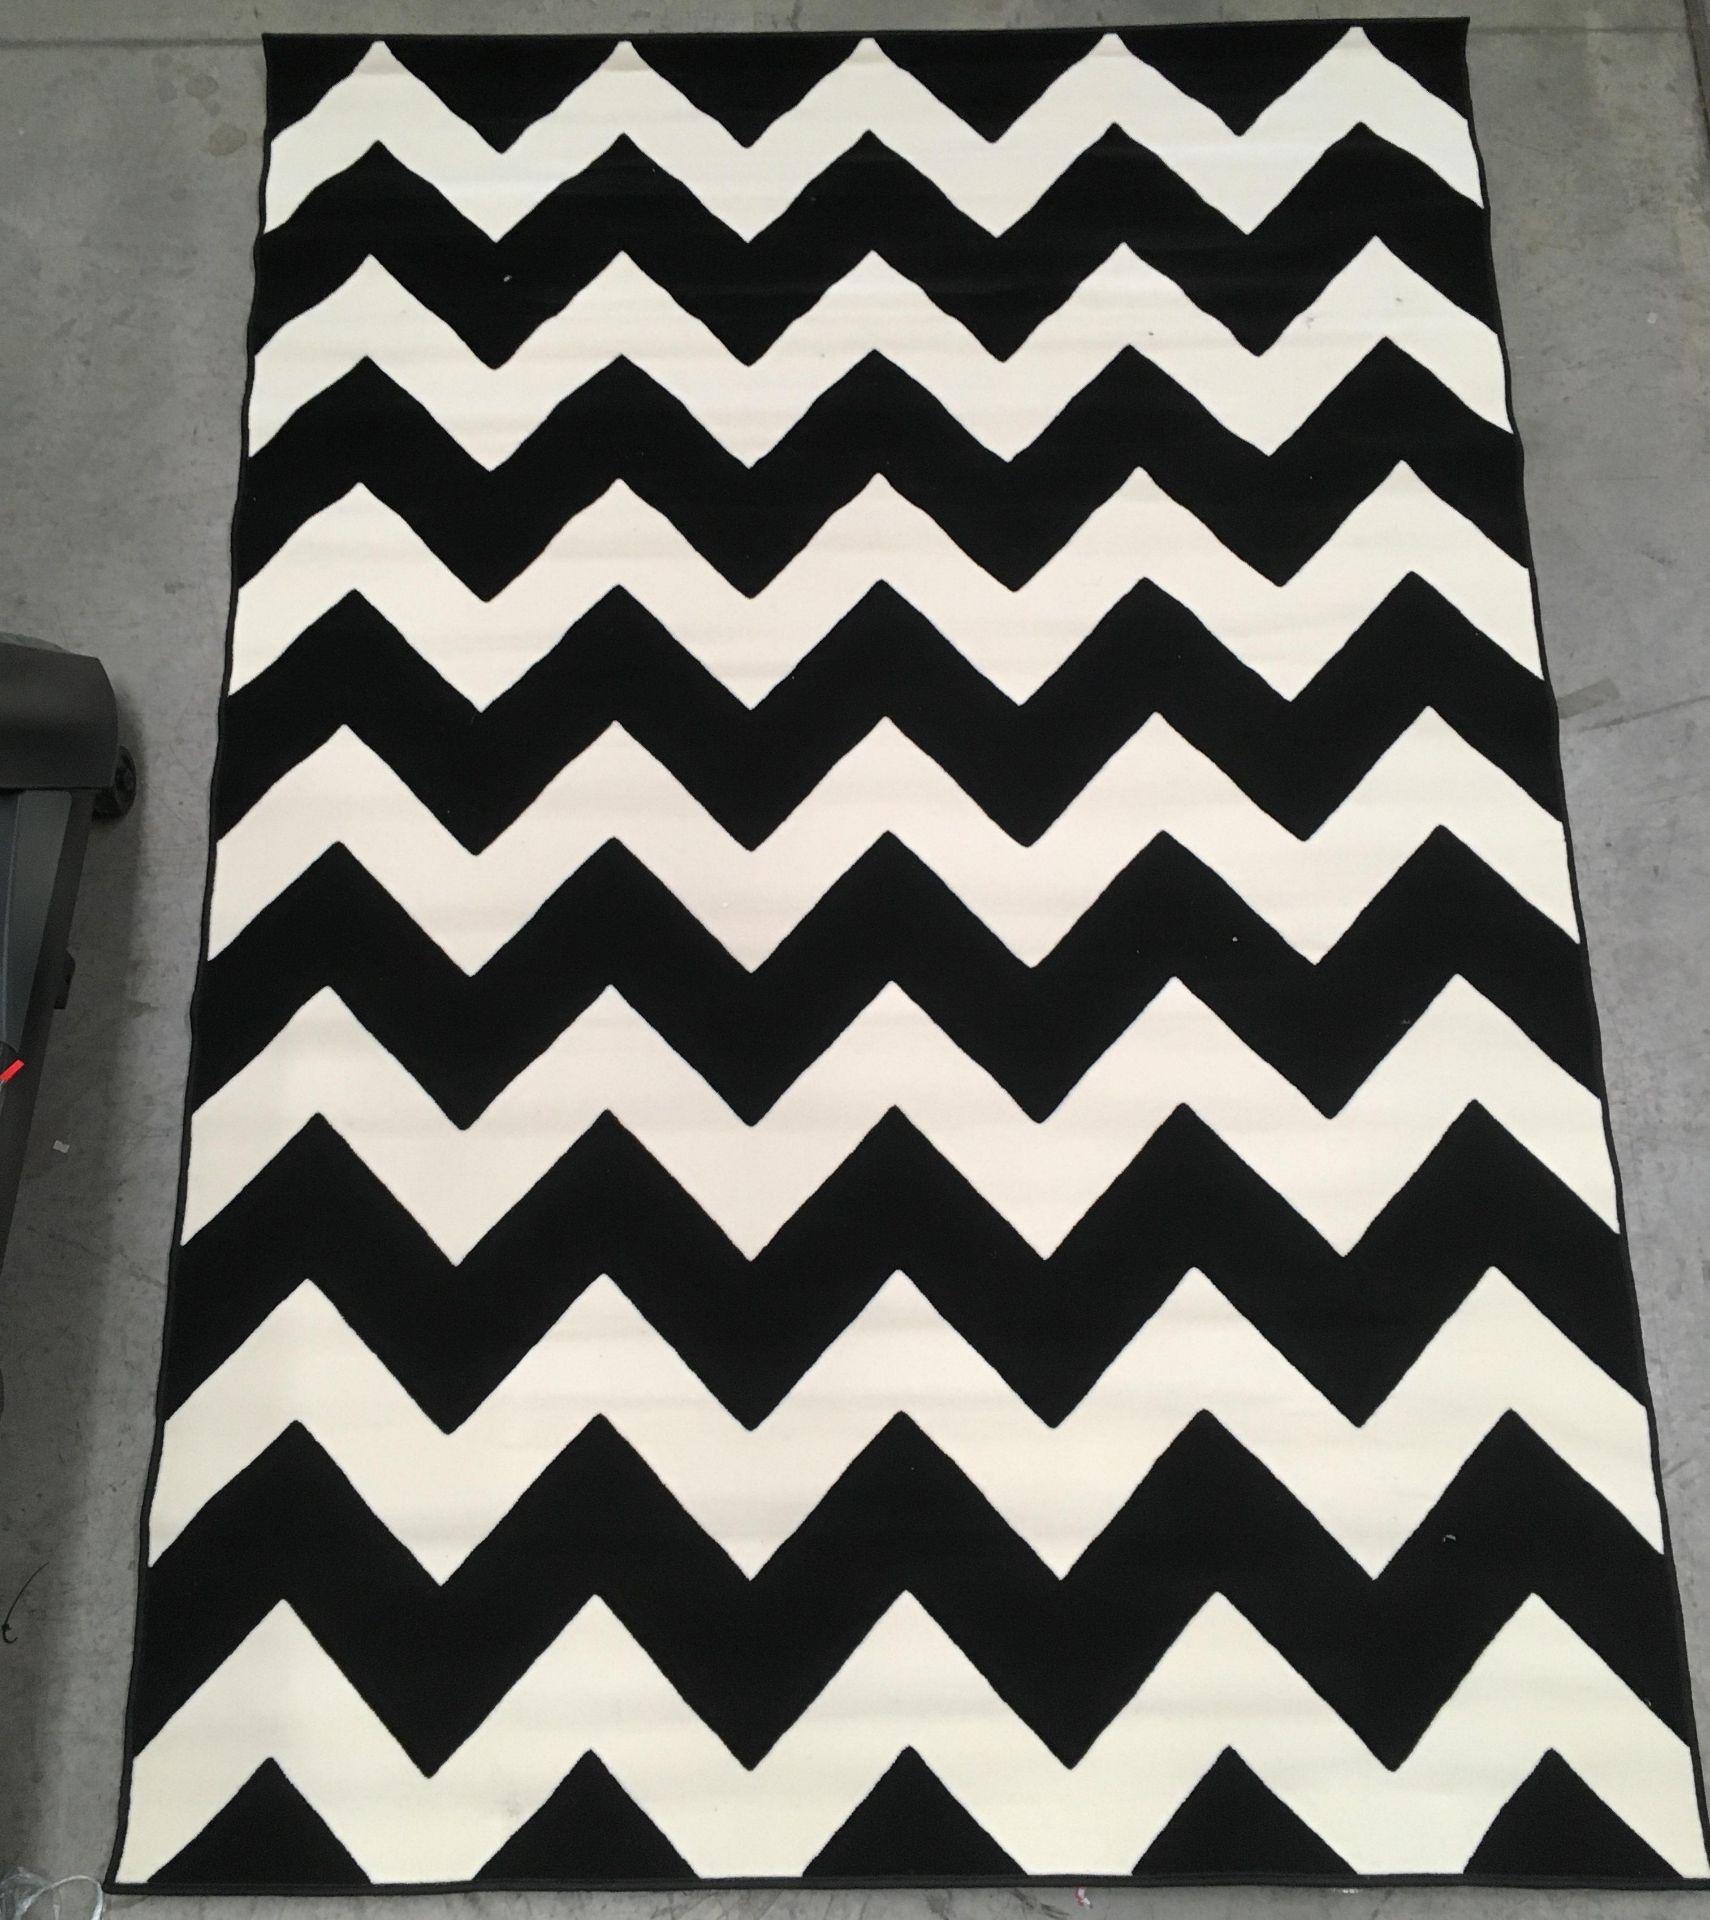 Lot 21 - A Kayoom MAR2085 Schwartz black and white rug - 200cm x 290cm